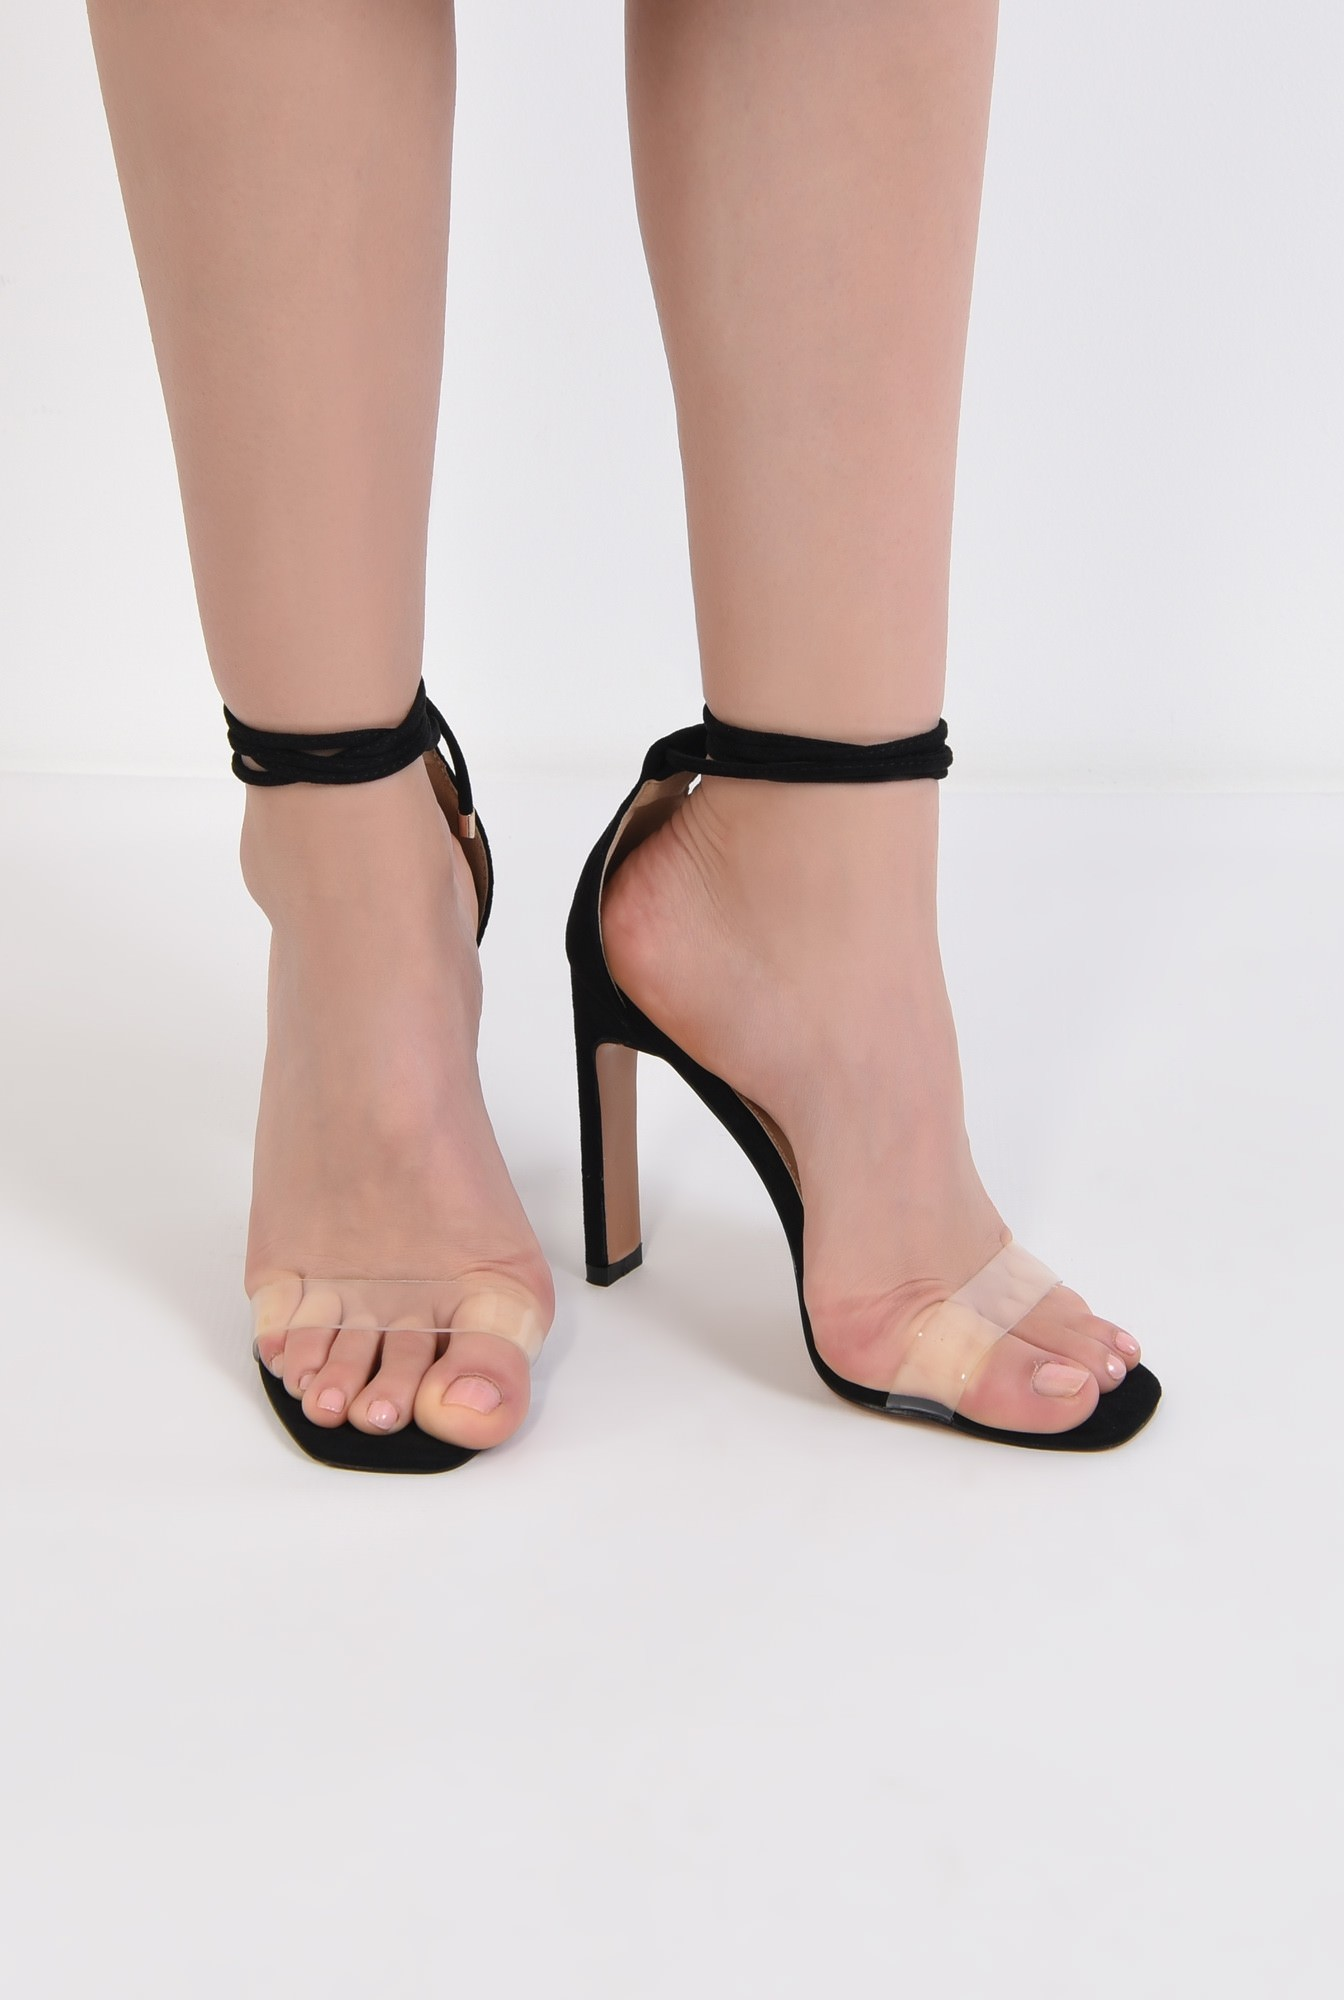 1 - sandale de ocazie, din velur, bareta transparenta, toc bricheta